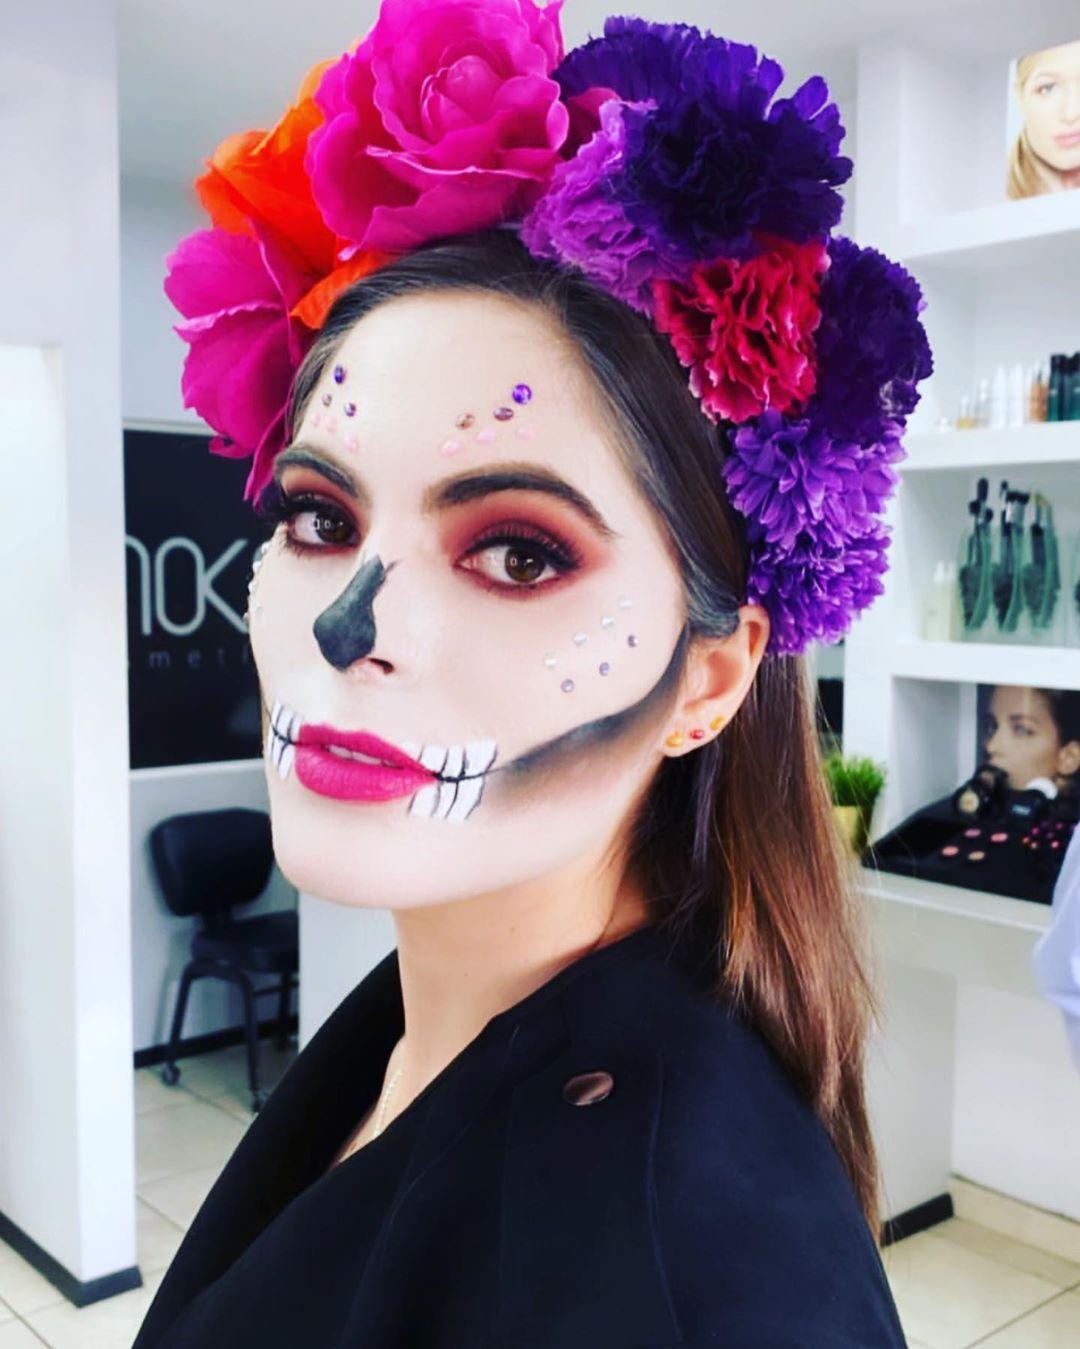 sofia aragon, 2nd runner-up de miss universe 2019. - Página 6 71322810